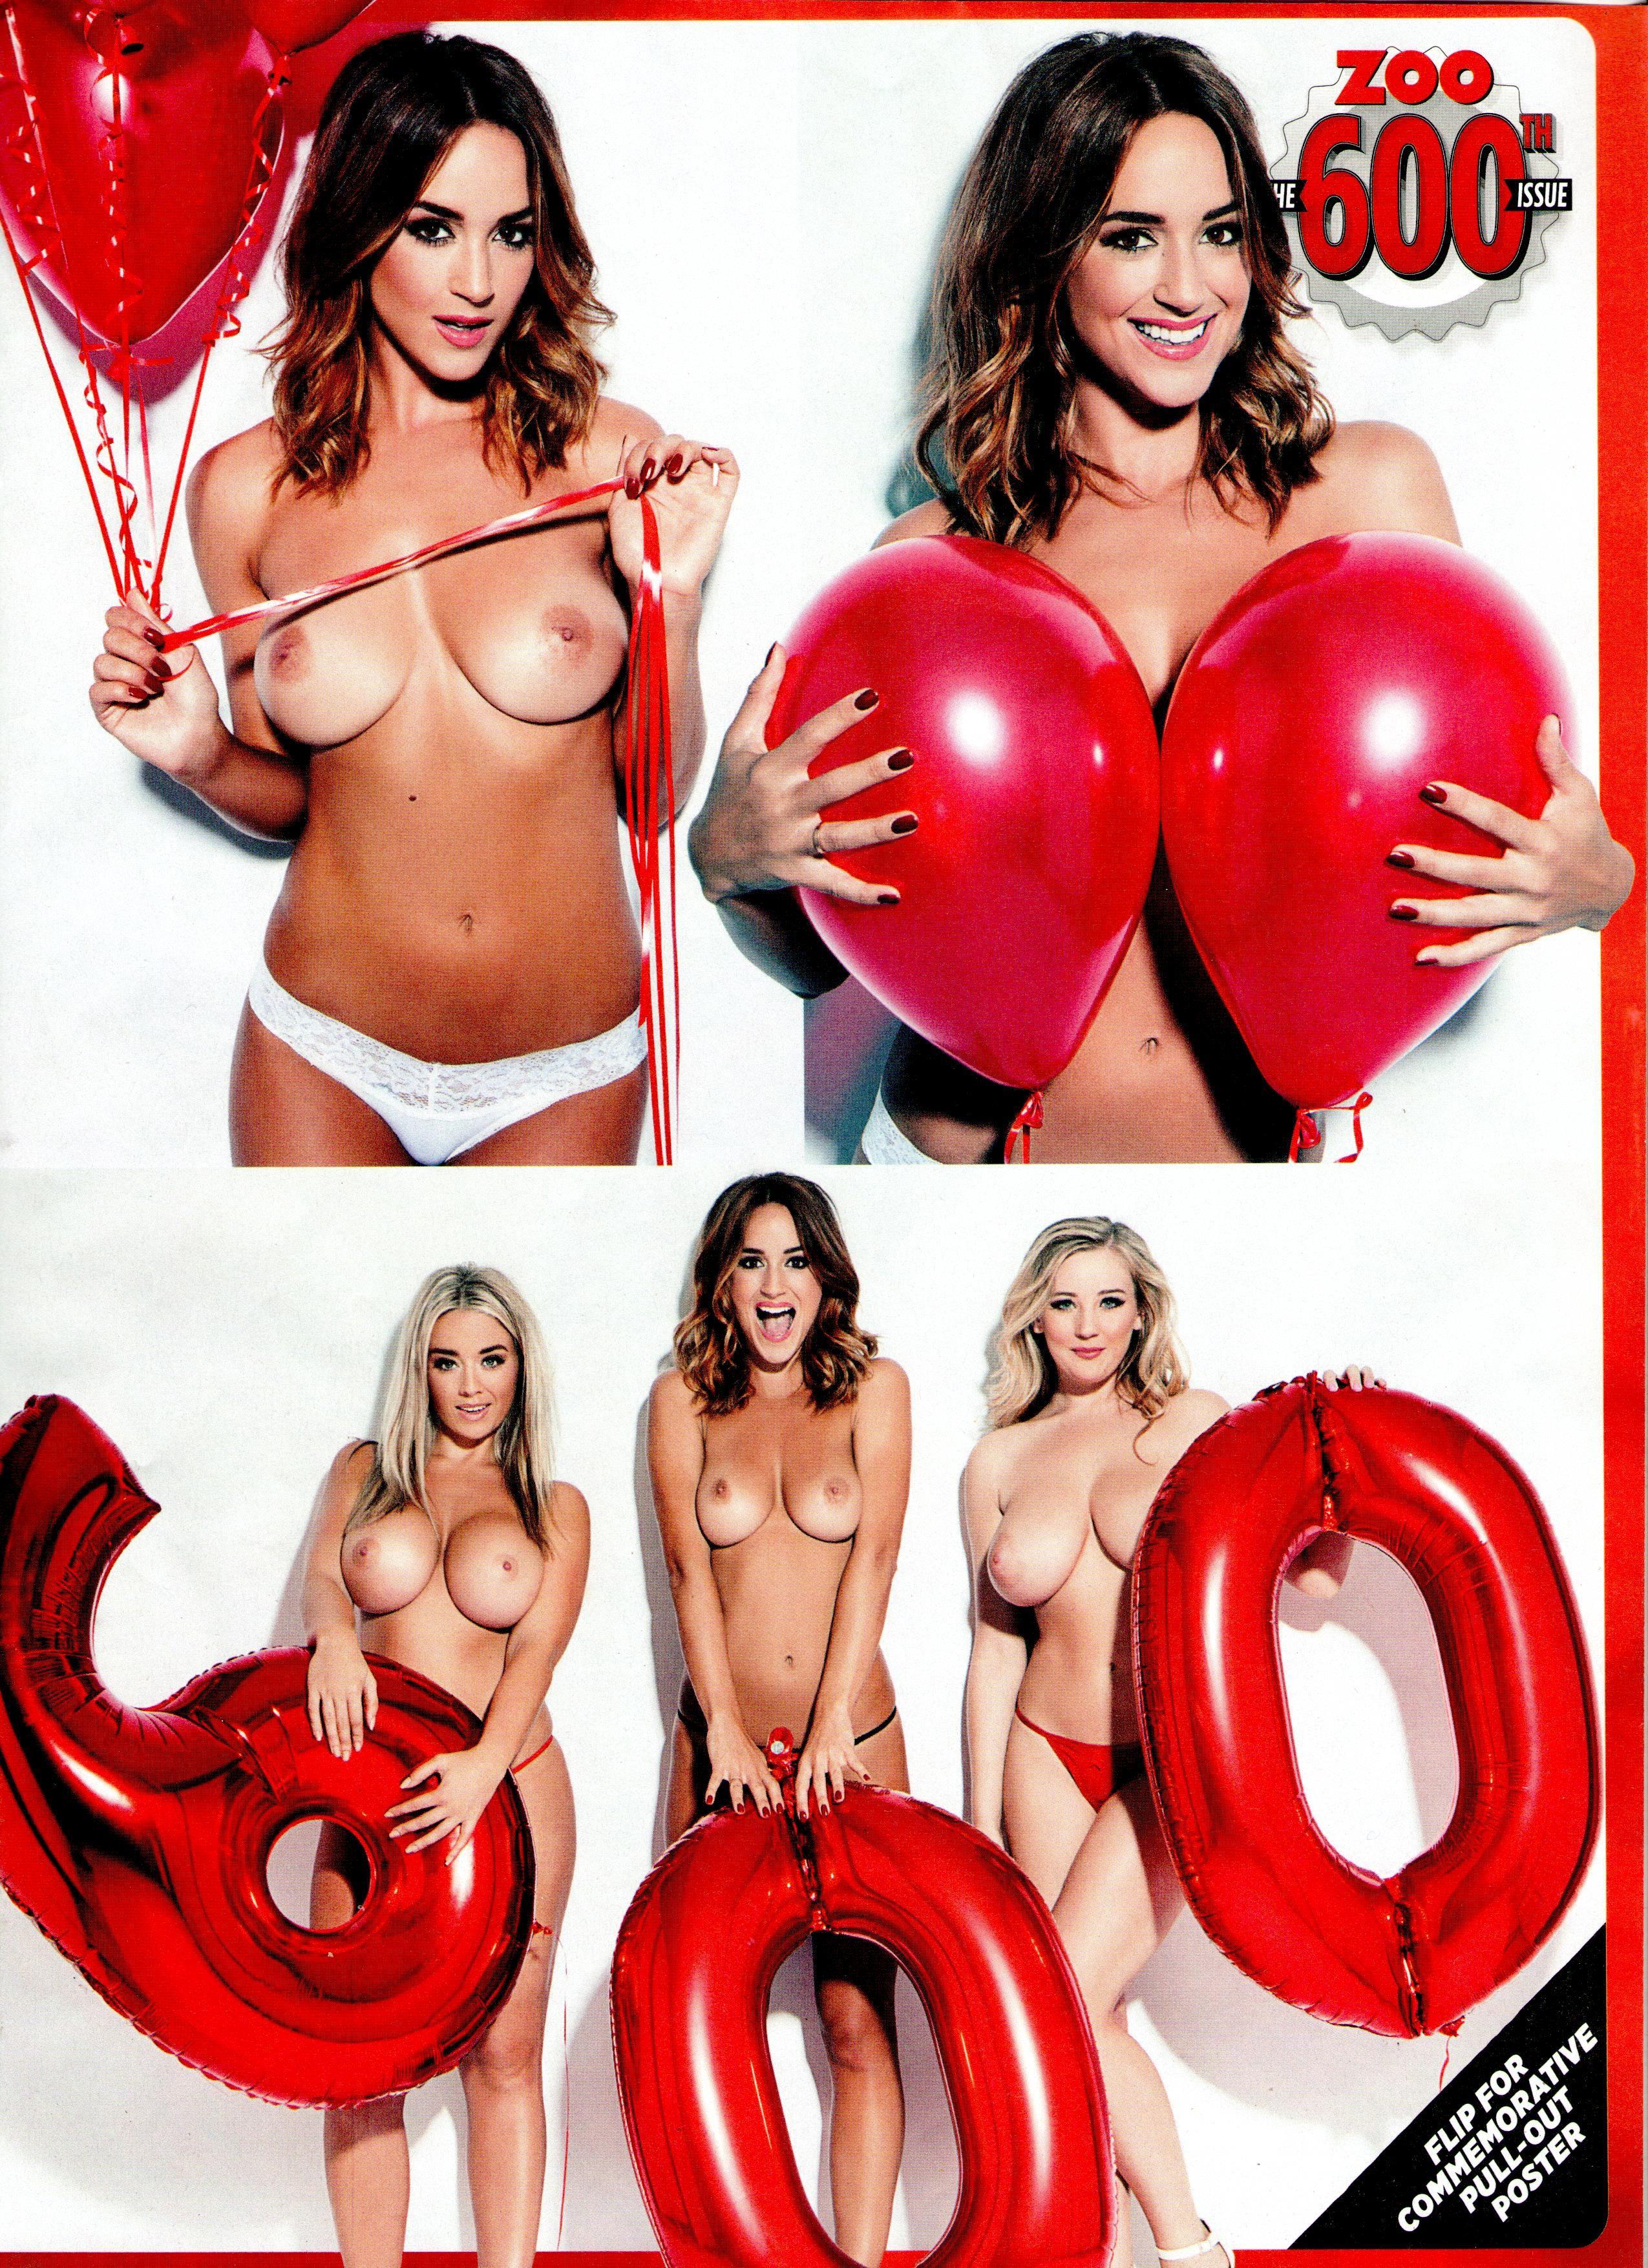 Rosie-Jones-Melissa-Debling-Bethany-Lily-Topless-10